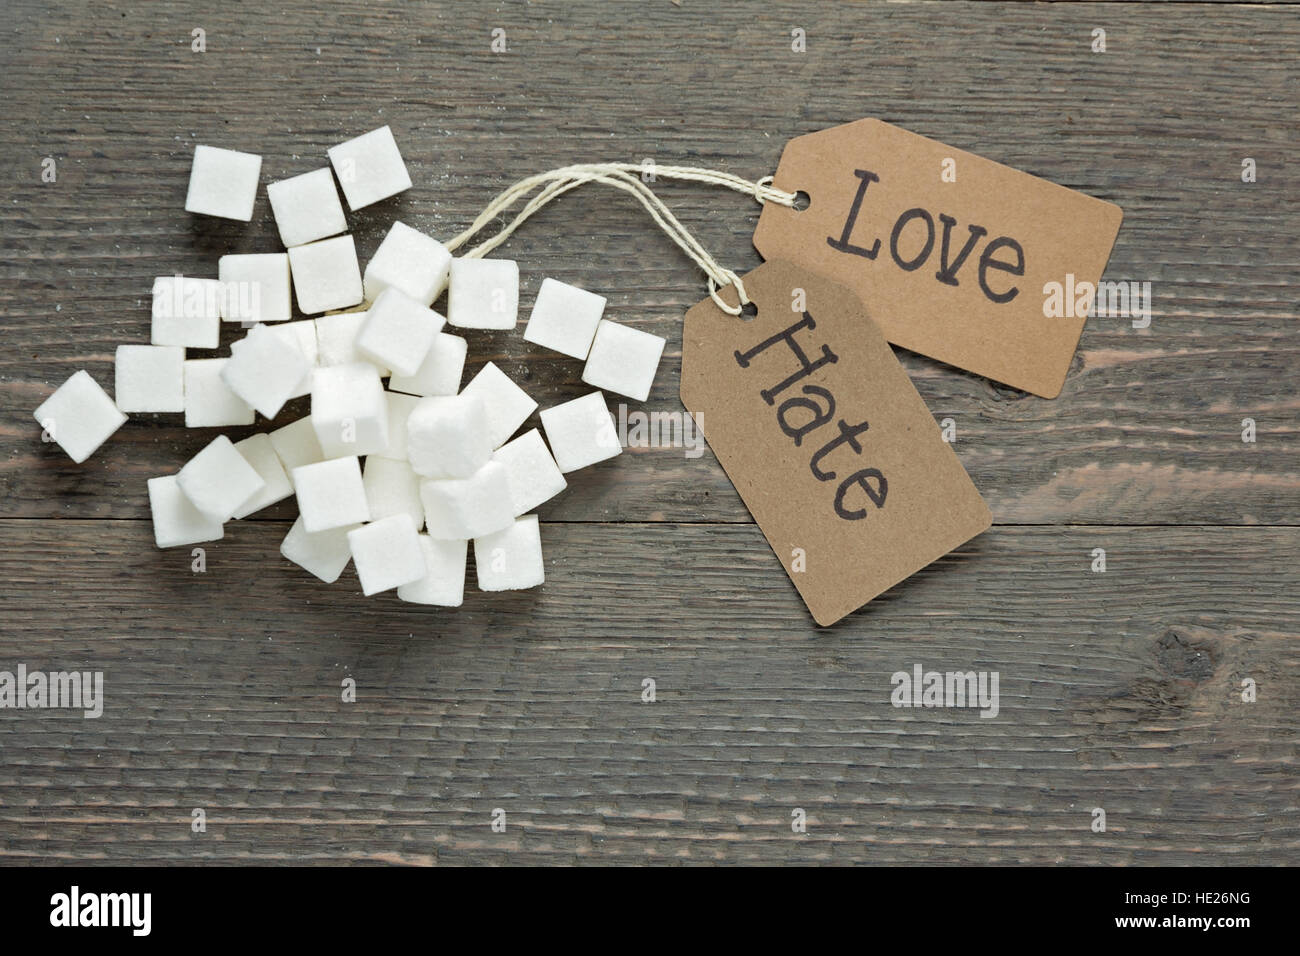 Love versus hate for sugar - Stock Image